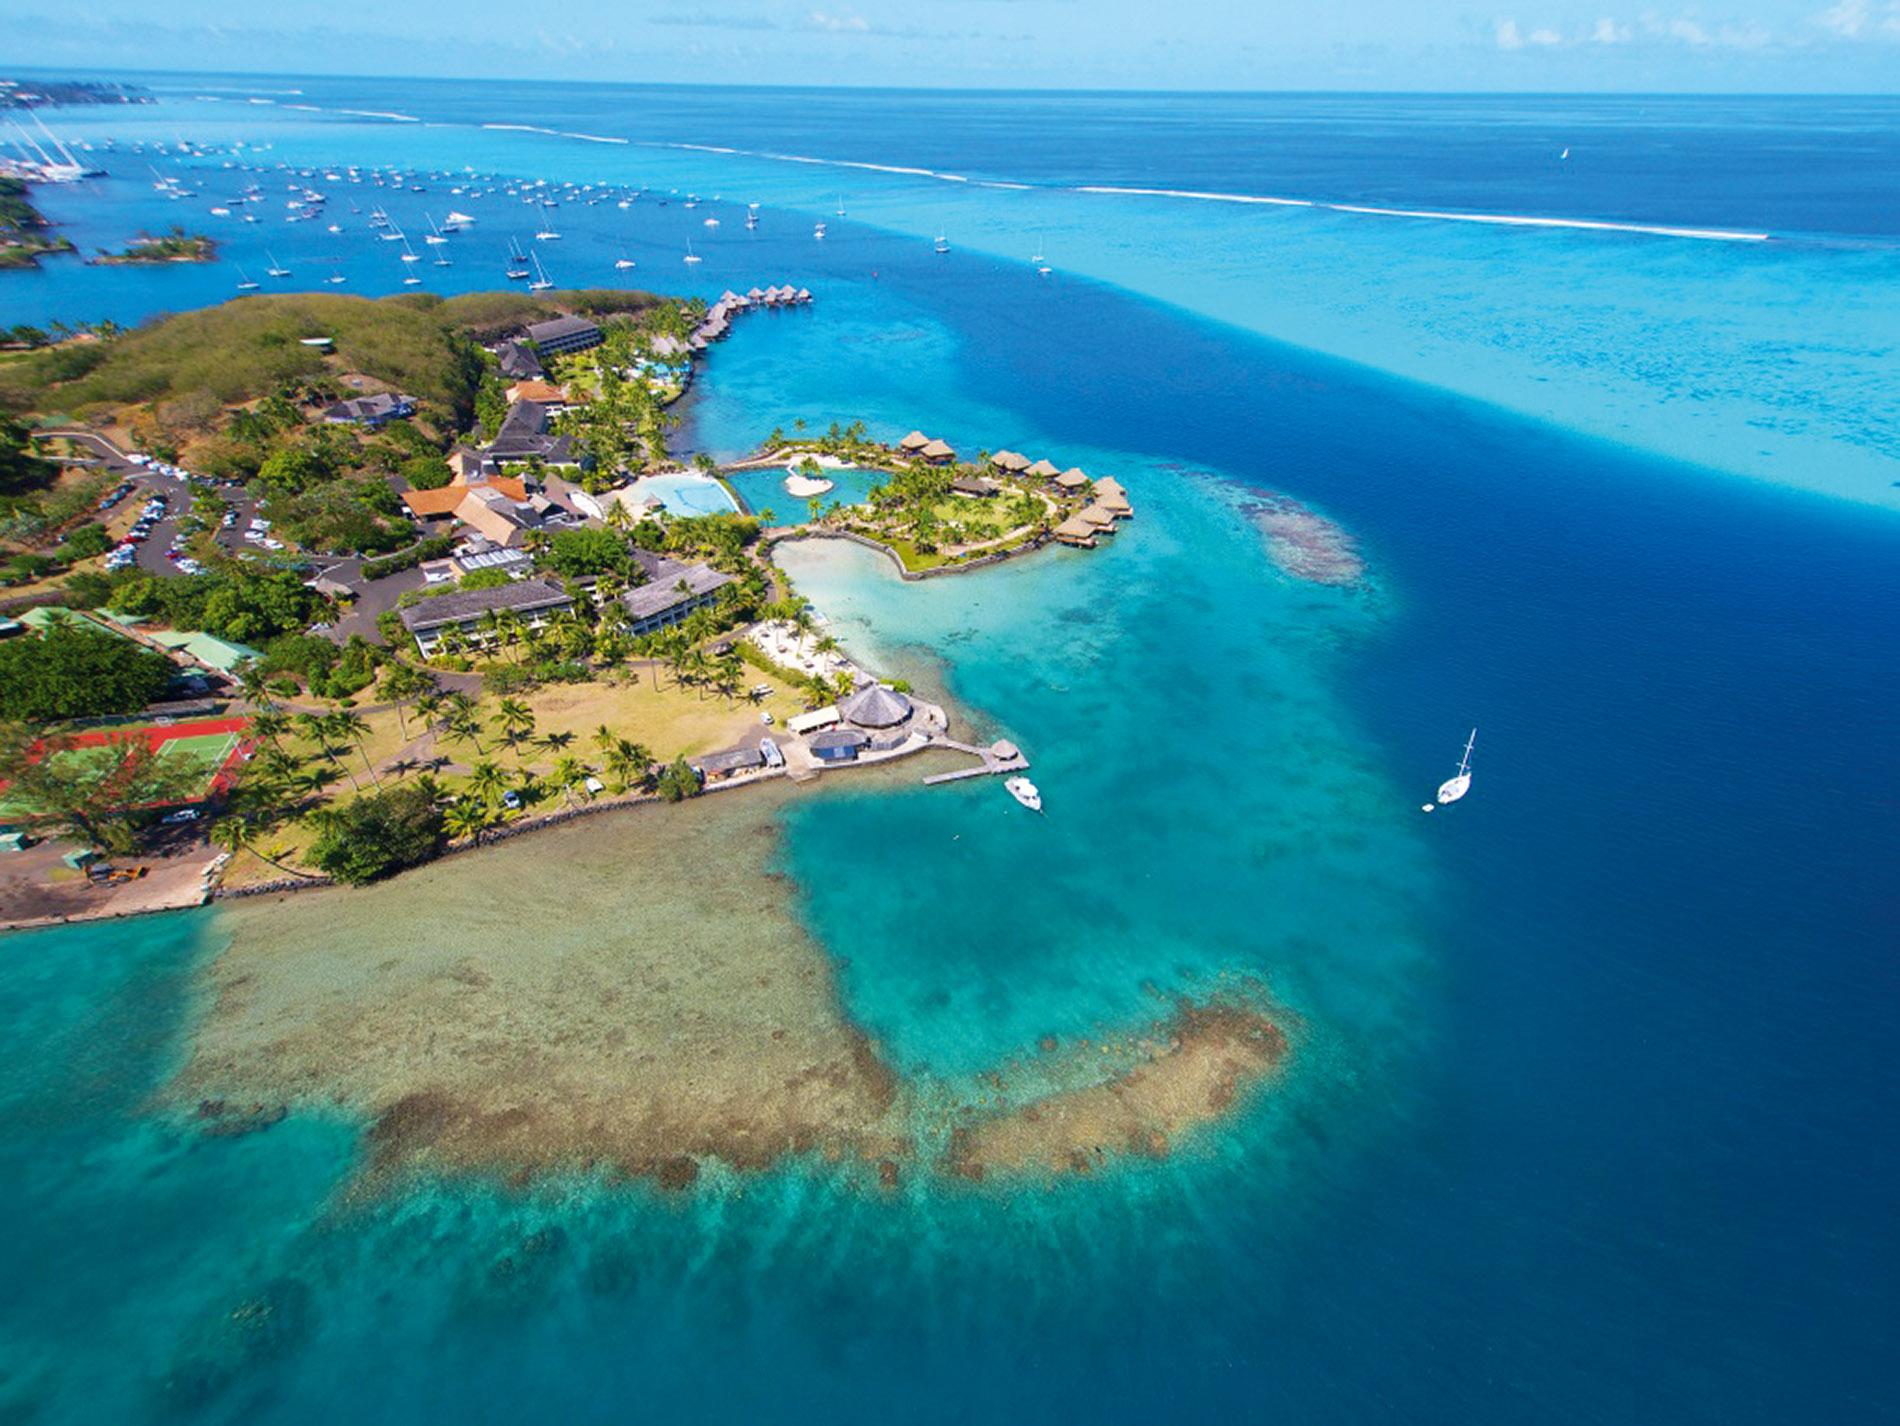 Stadt Auf Tahiti